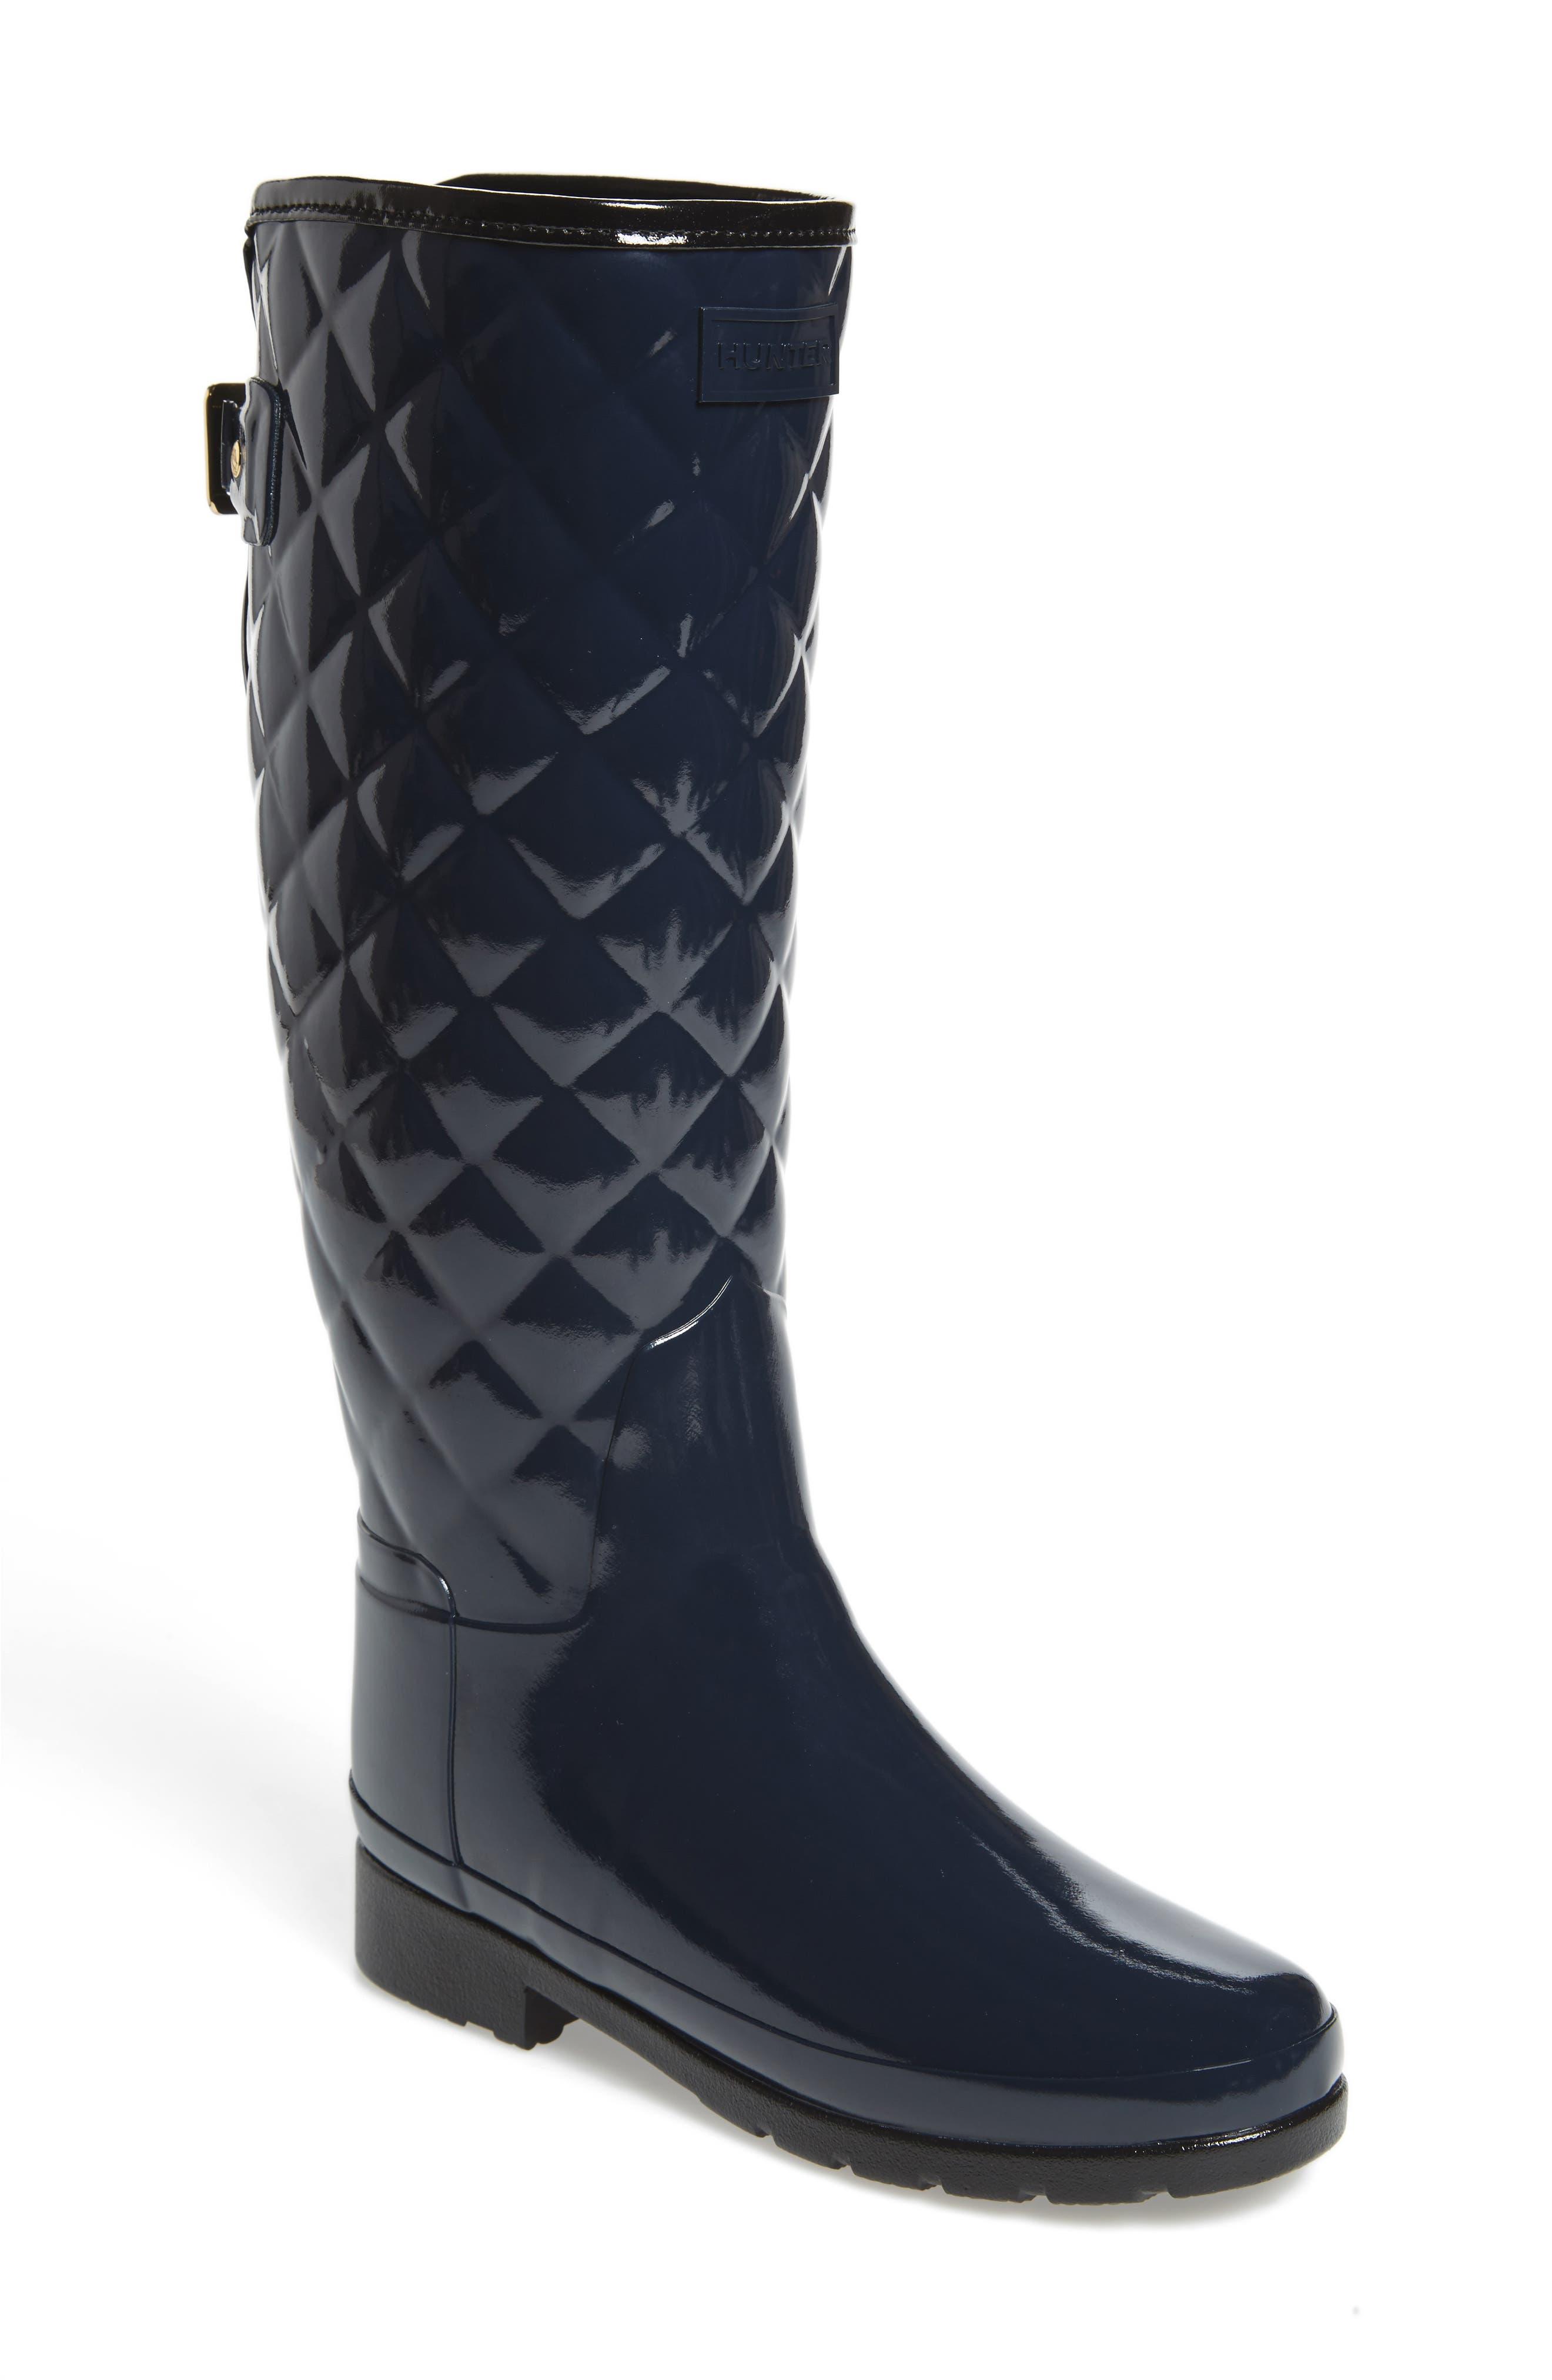 Alternate Image 1 Selected - Hunter Original Refined High Gloss Quilted Rain Boot (Women)